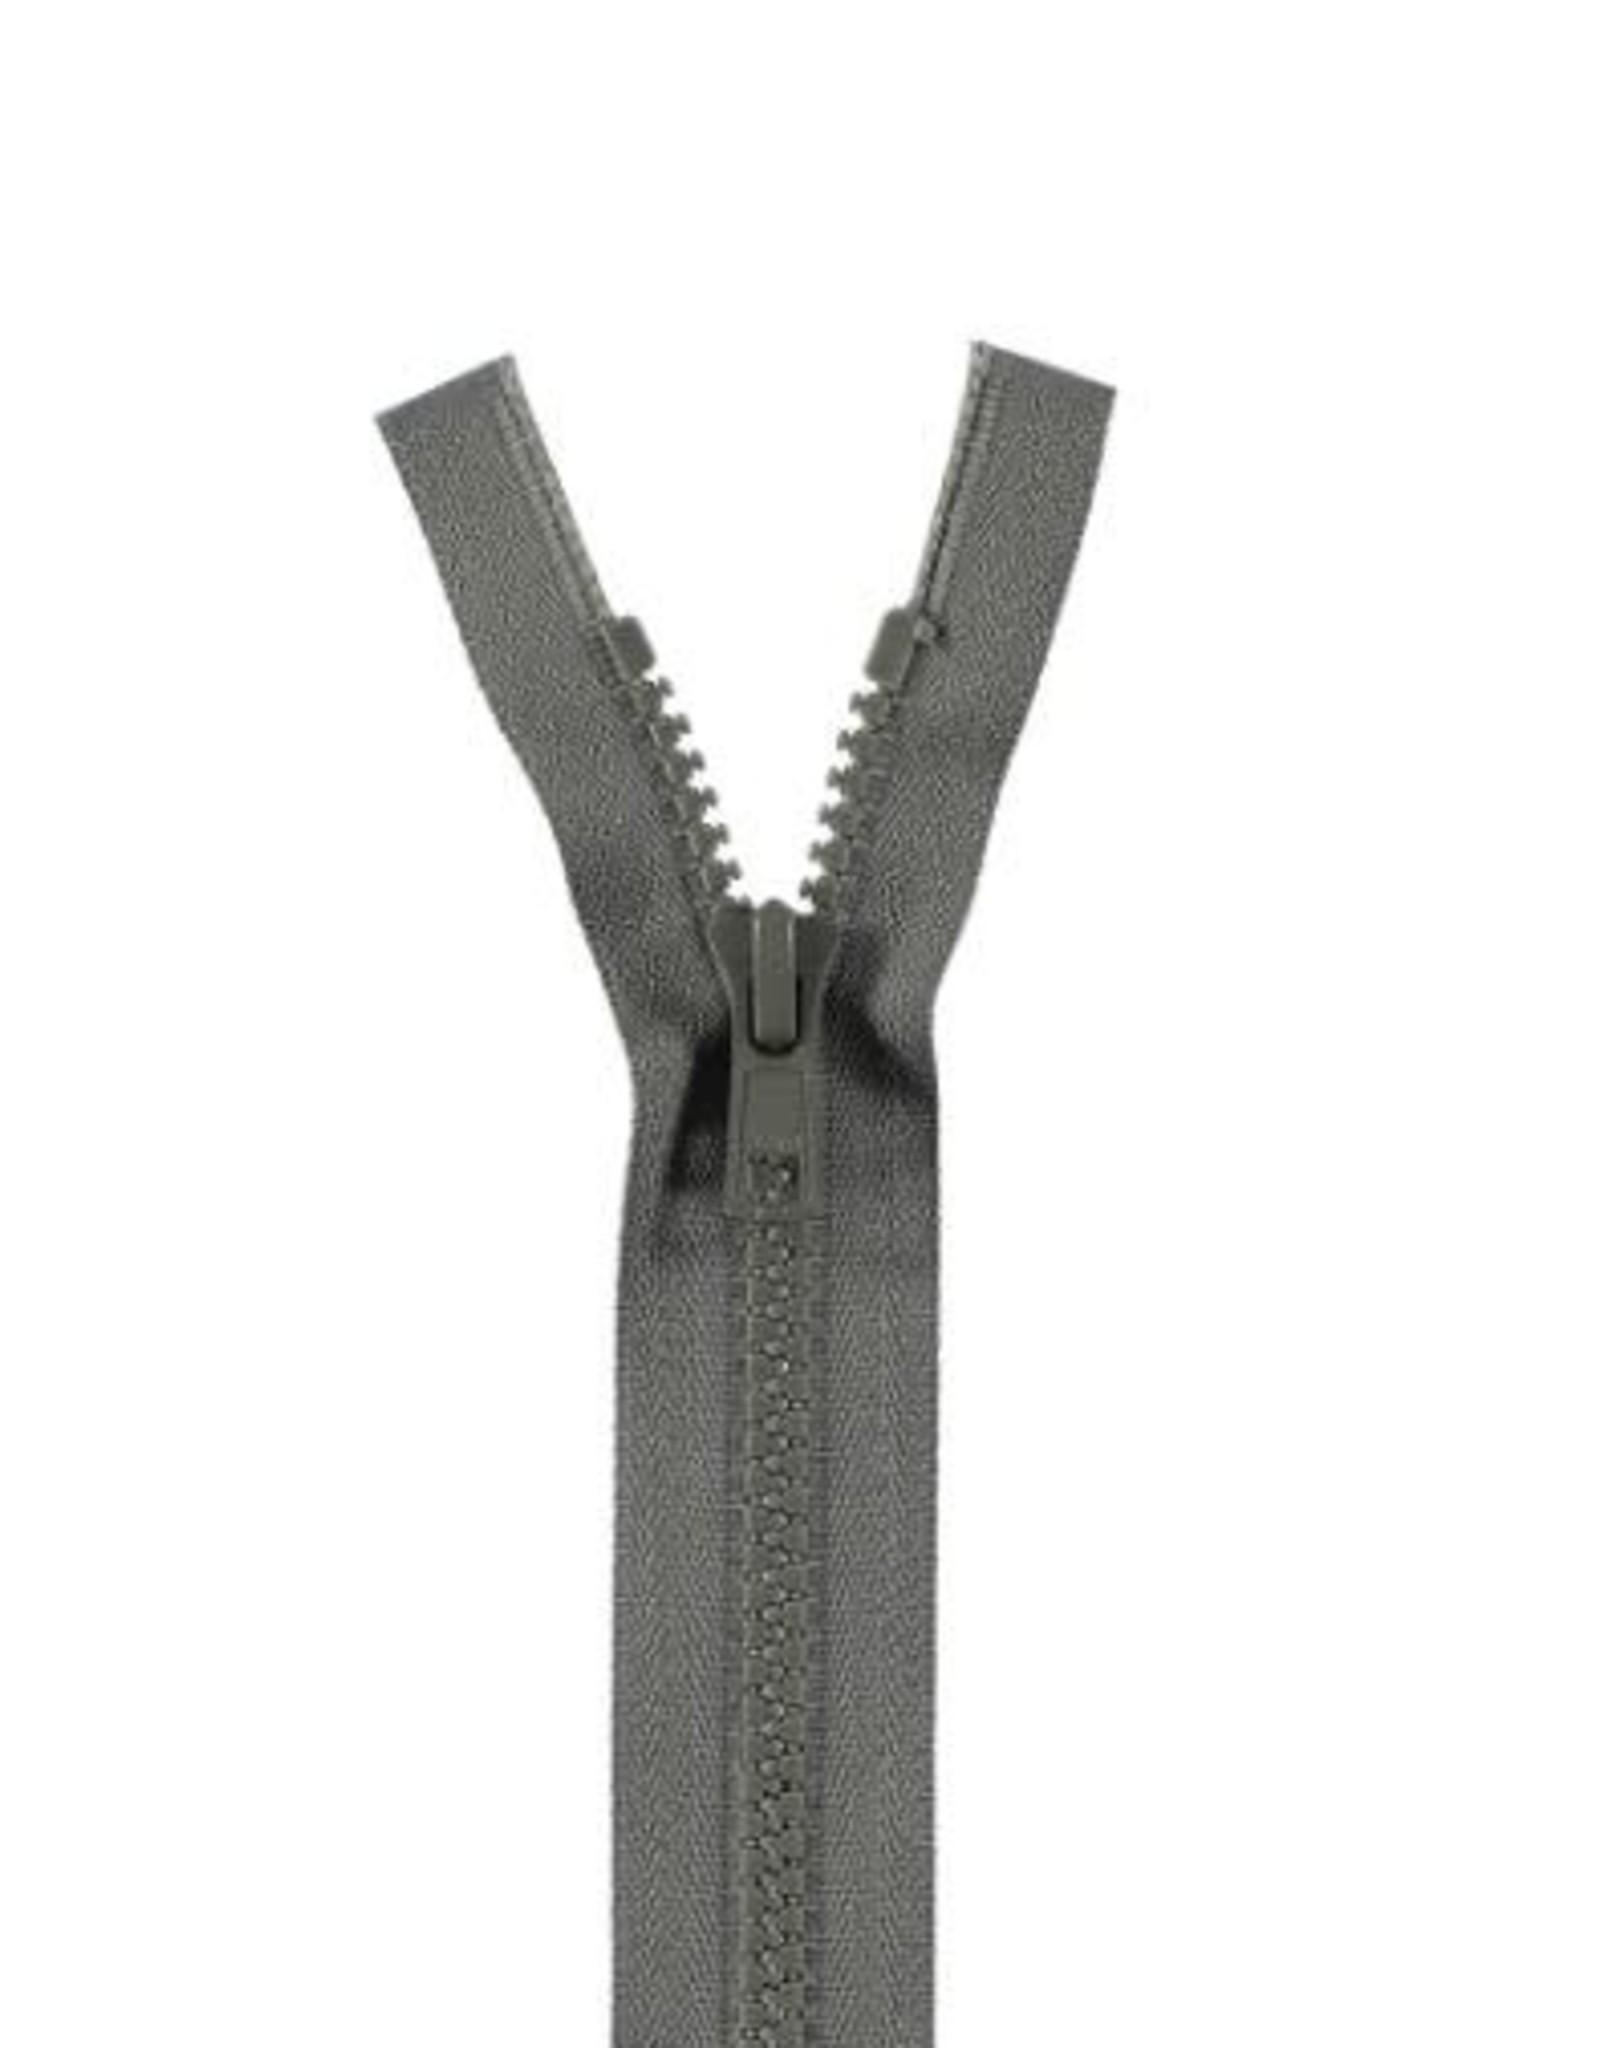 YKK BLOKRITS 5 DEELBAAR grijs 578-70cm